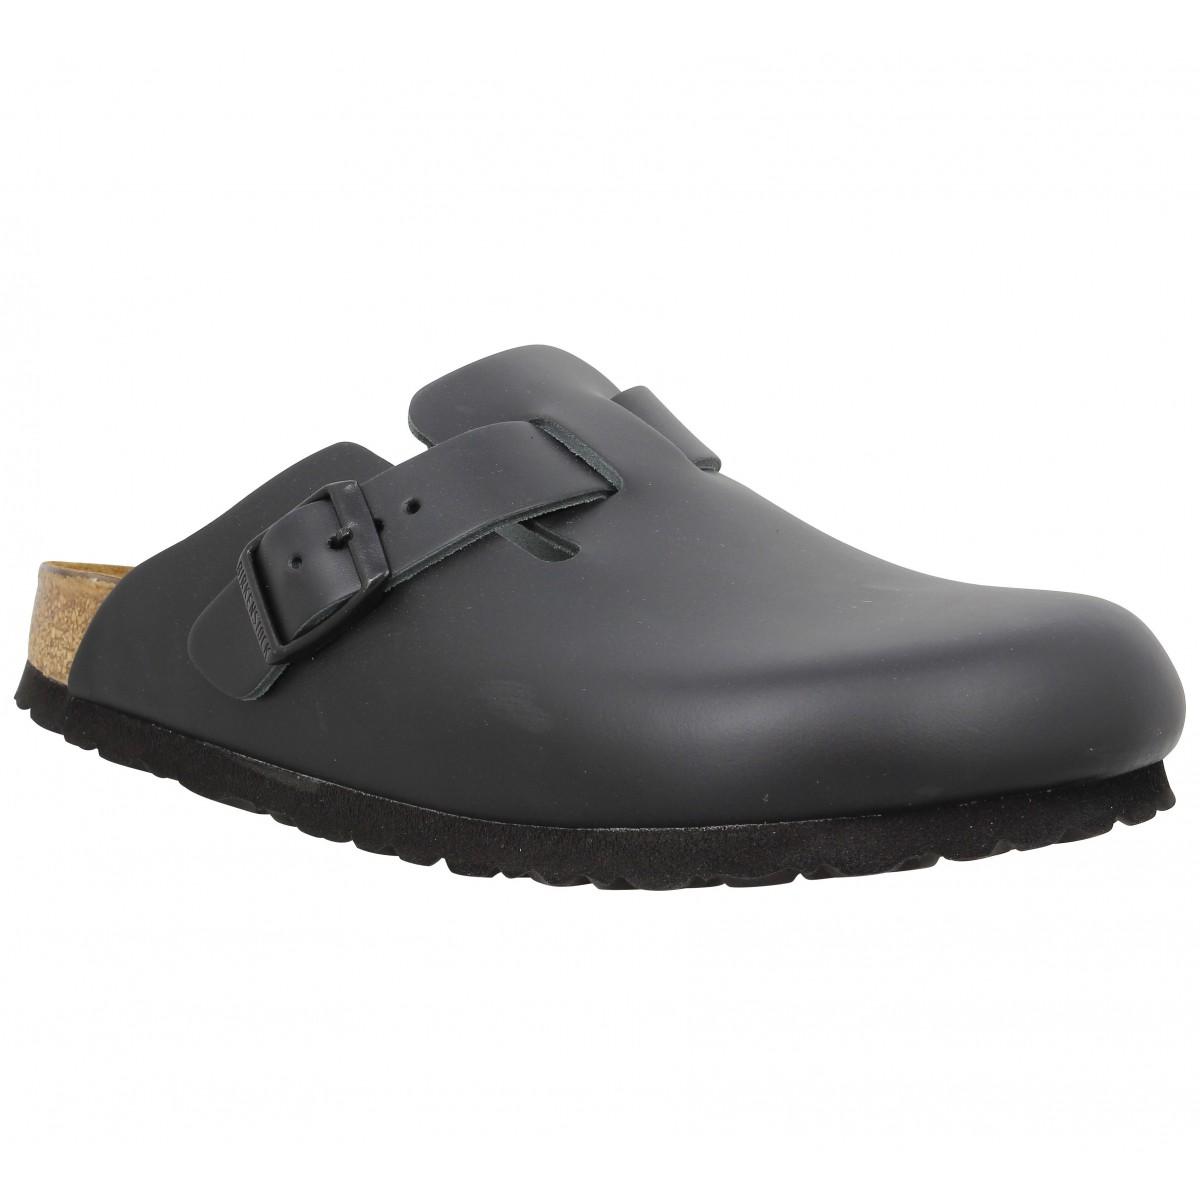 En Vente Birkenstock Pour Homme Chaussures Ligne 8nv0OmNw